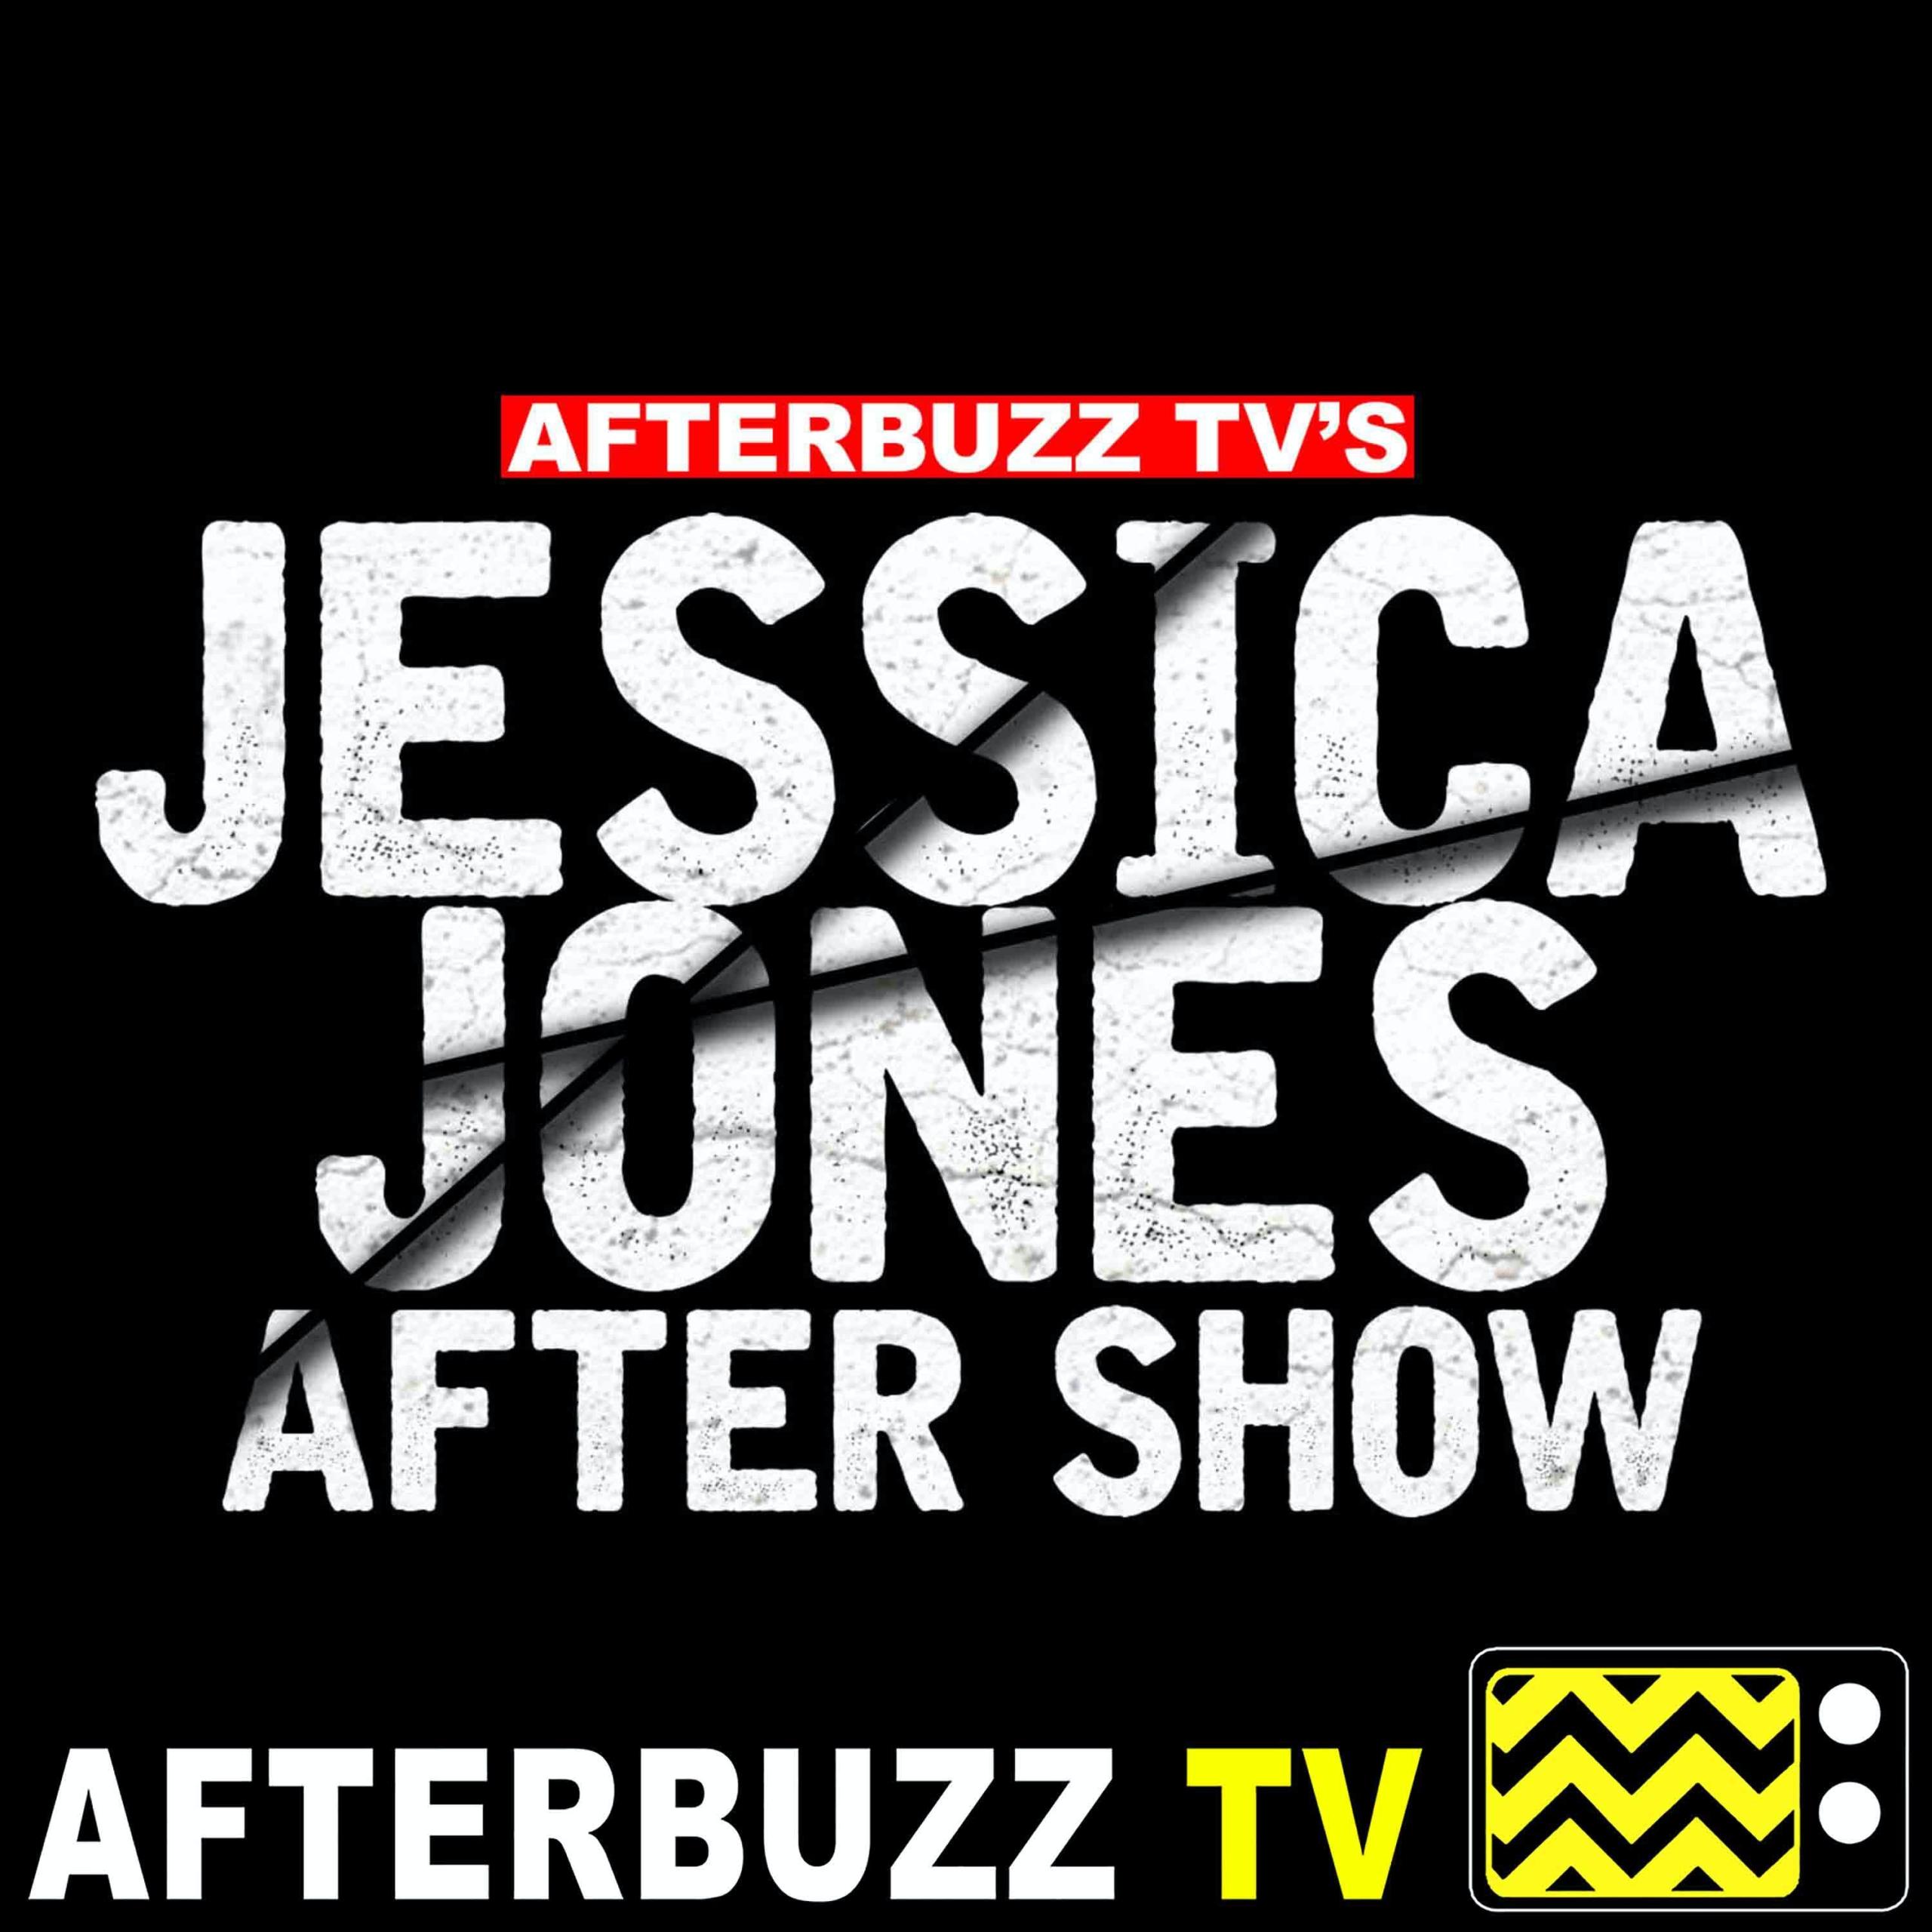 """AKA Everything"" Season 3 Episode 13 'Jessica Jones'"